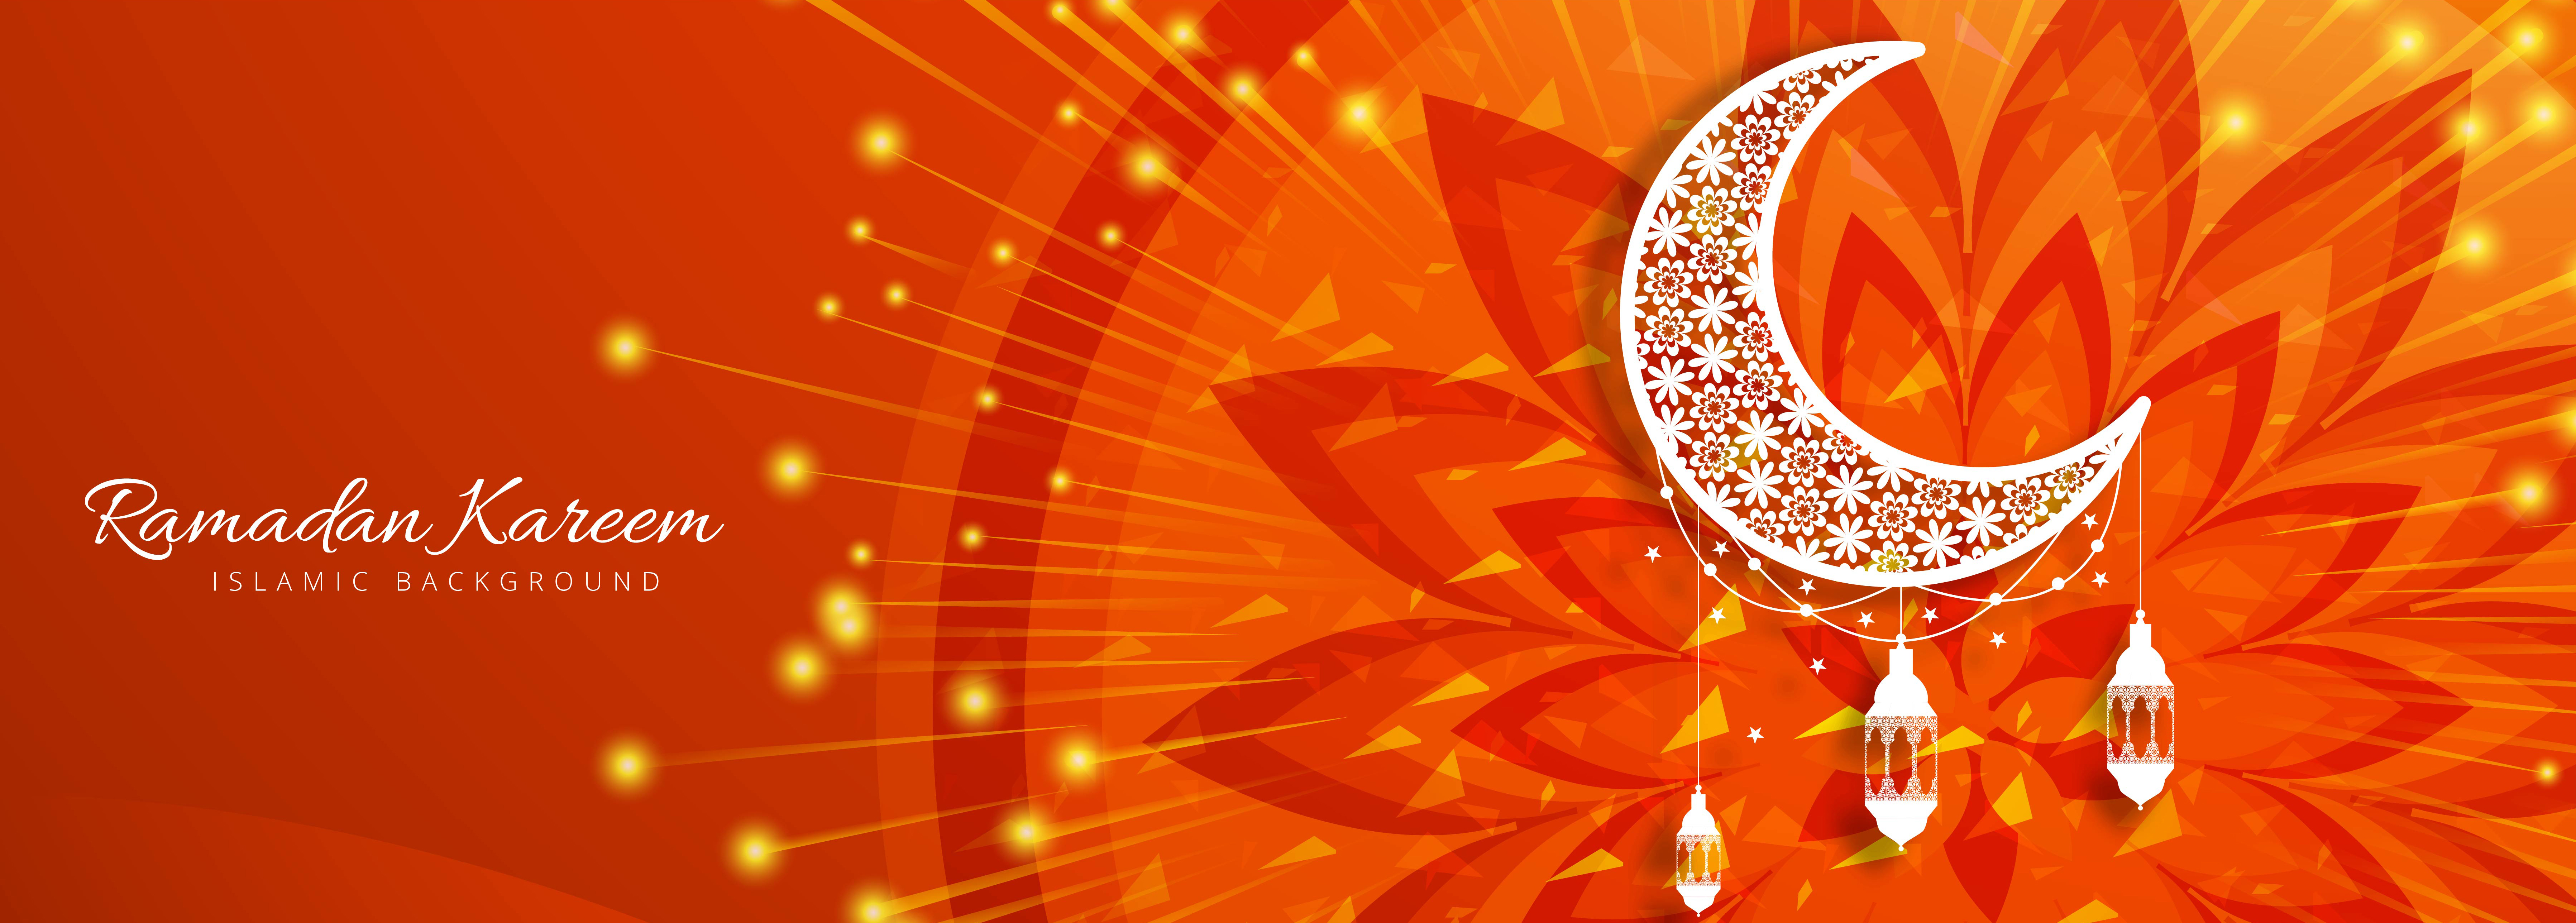 Ramadan Kareem Banner Red Orange 677349 Vector Art At Vecteezy